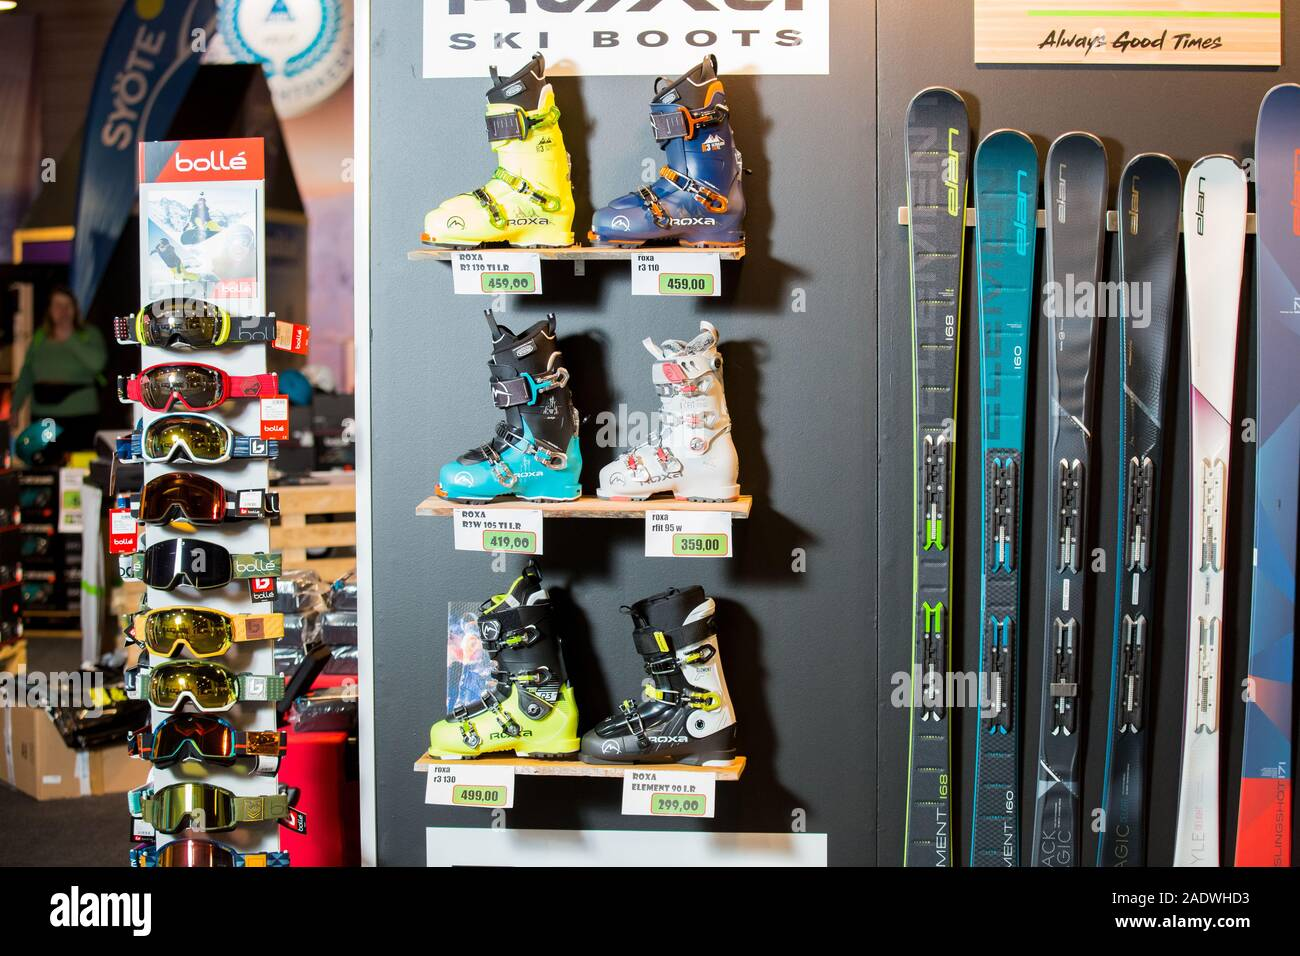 Ski Boots Sale >> Helsinki Finland November 15 2019 Ski Shop Sale Rows